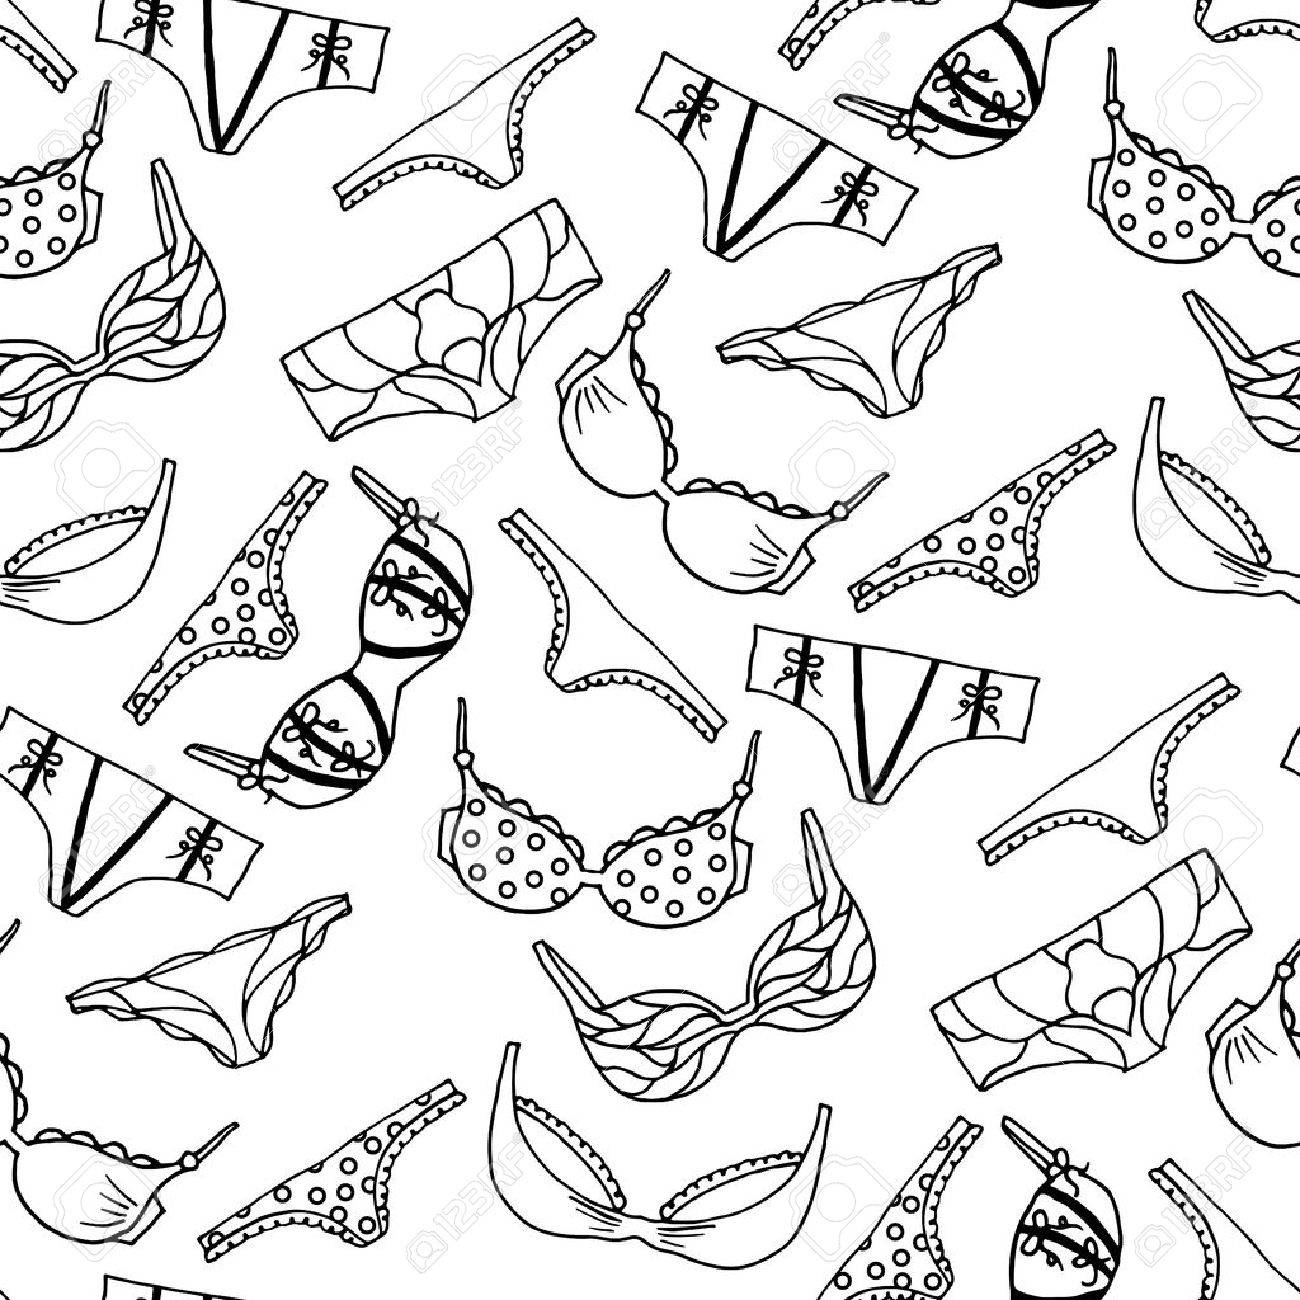 Vector Underwear Wallpaper Design Outline Hand Drawn Illustration Bras And